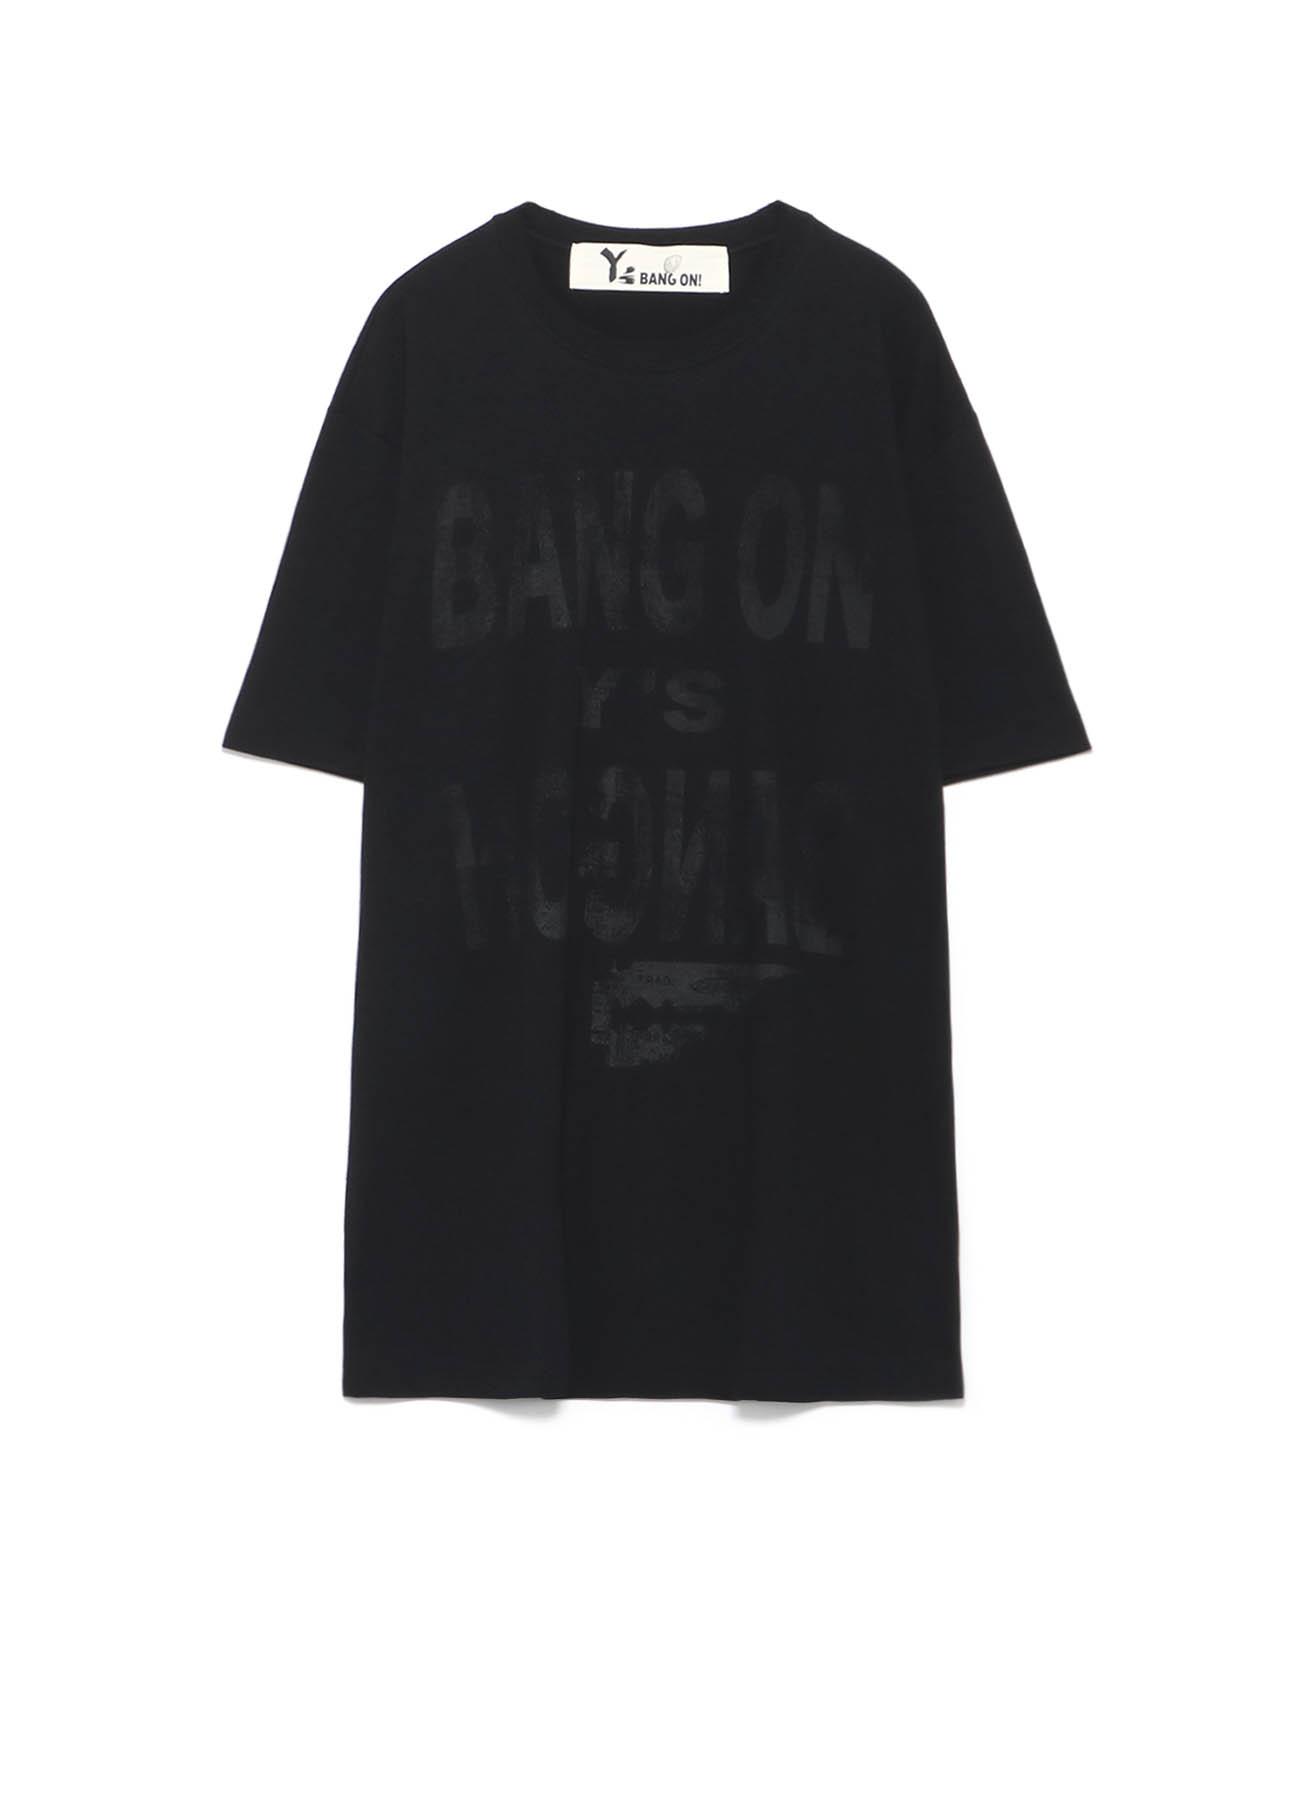 Y's BANG ON! Razor print T-Shirt